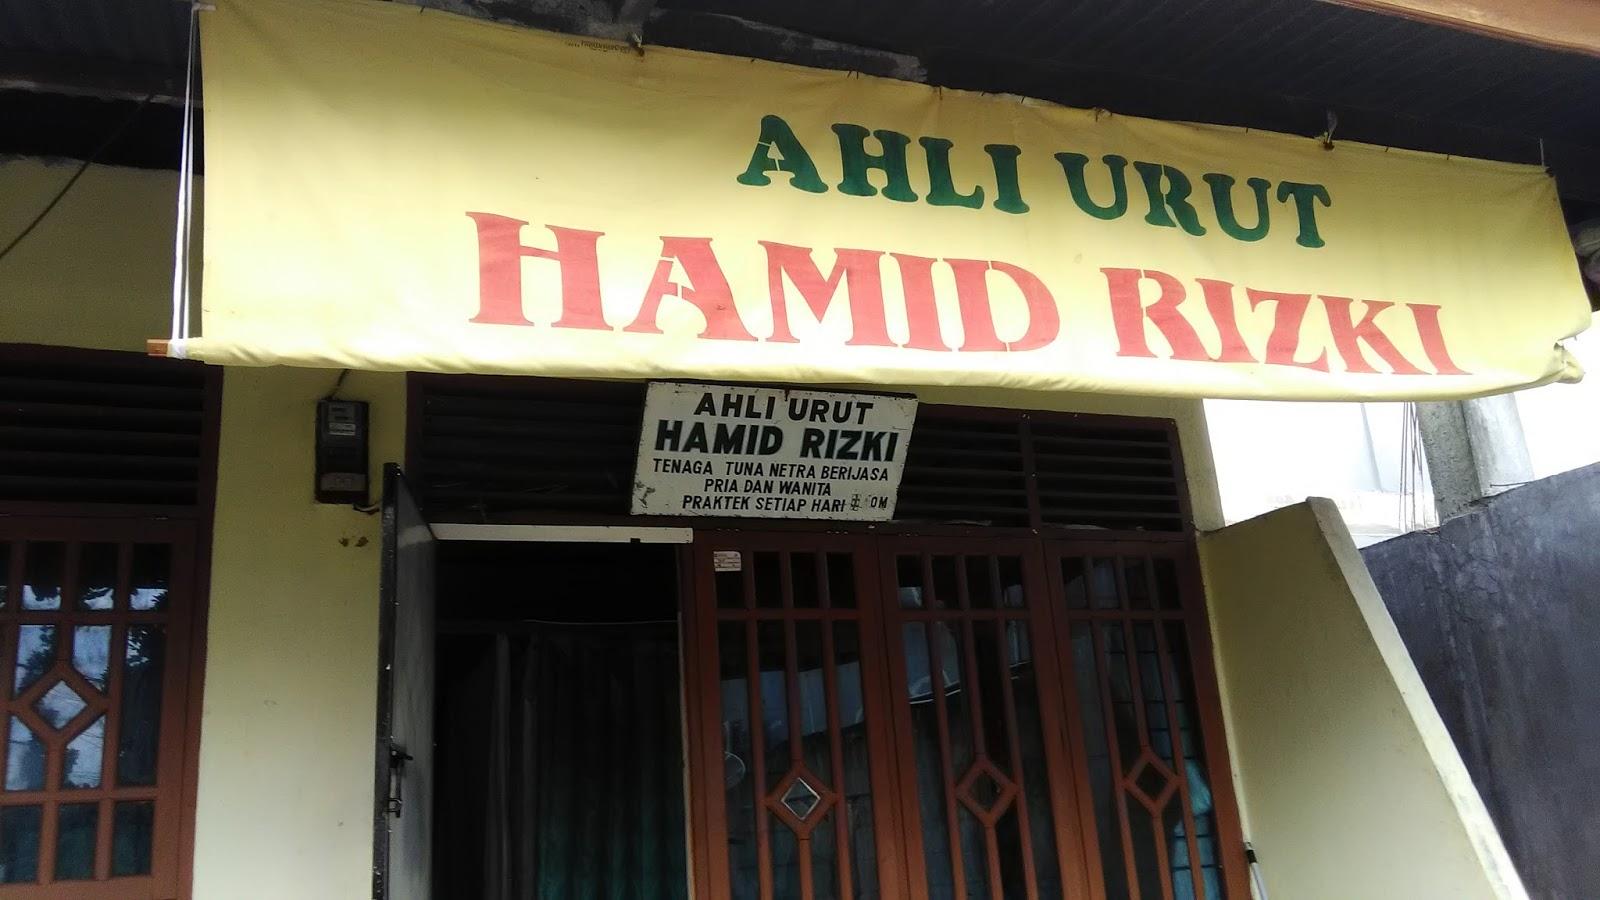 Ahli Urut Hamid Rizki